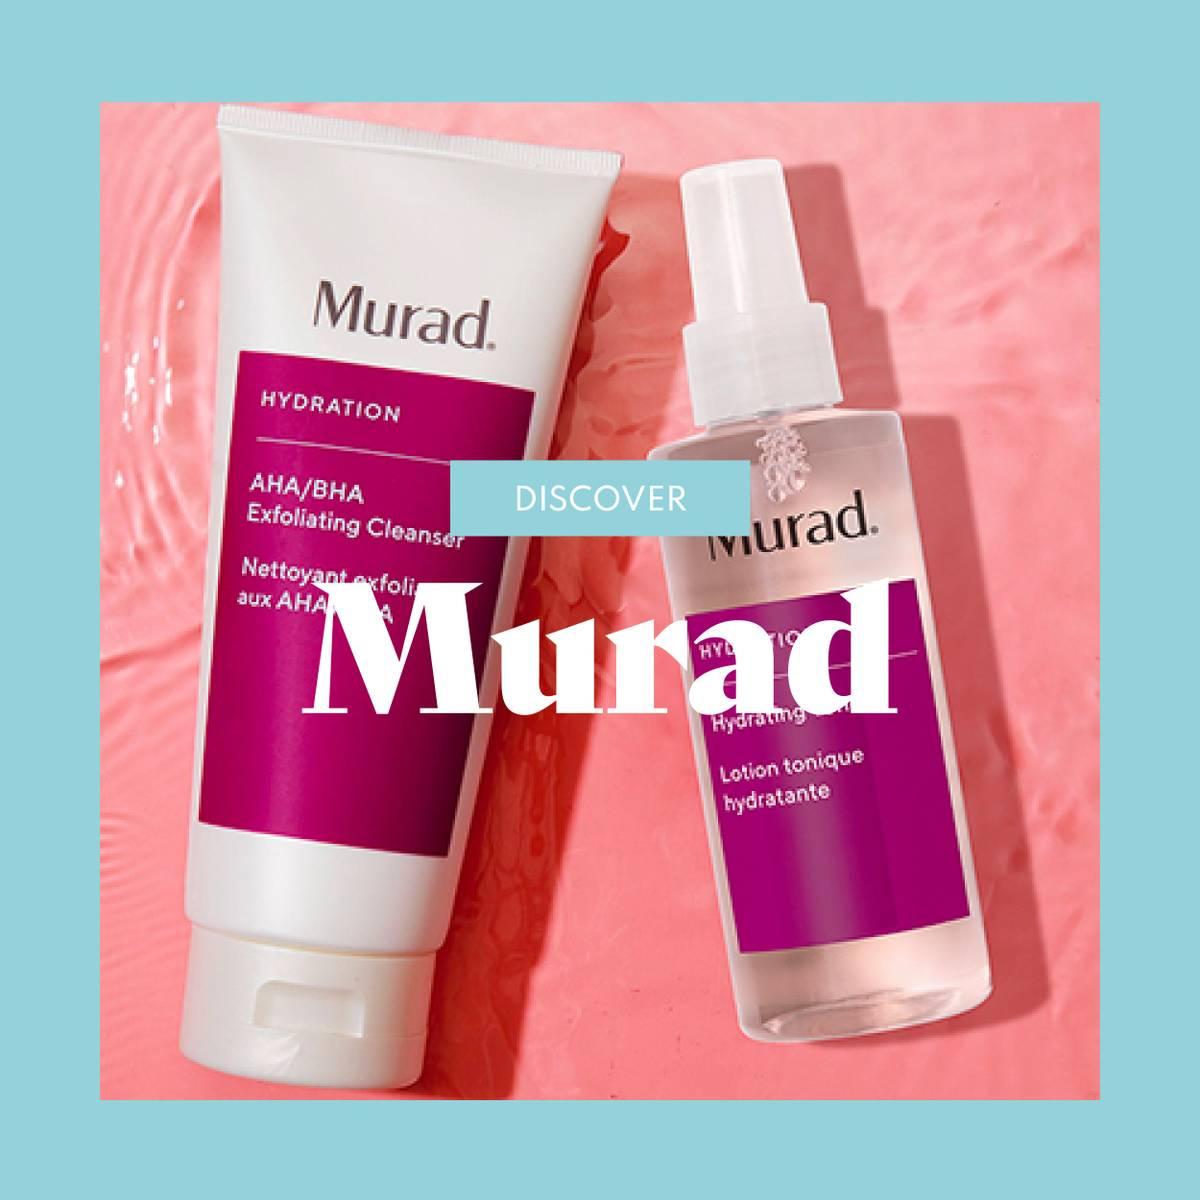 Discover - Murad